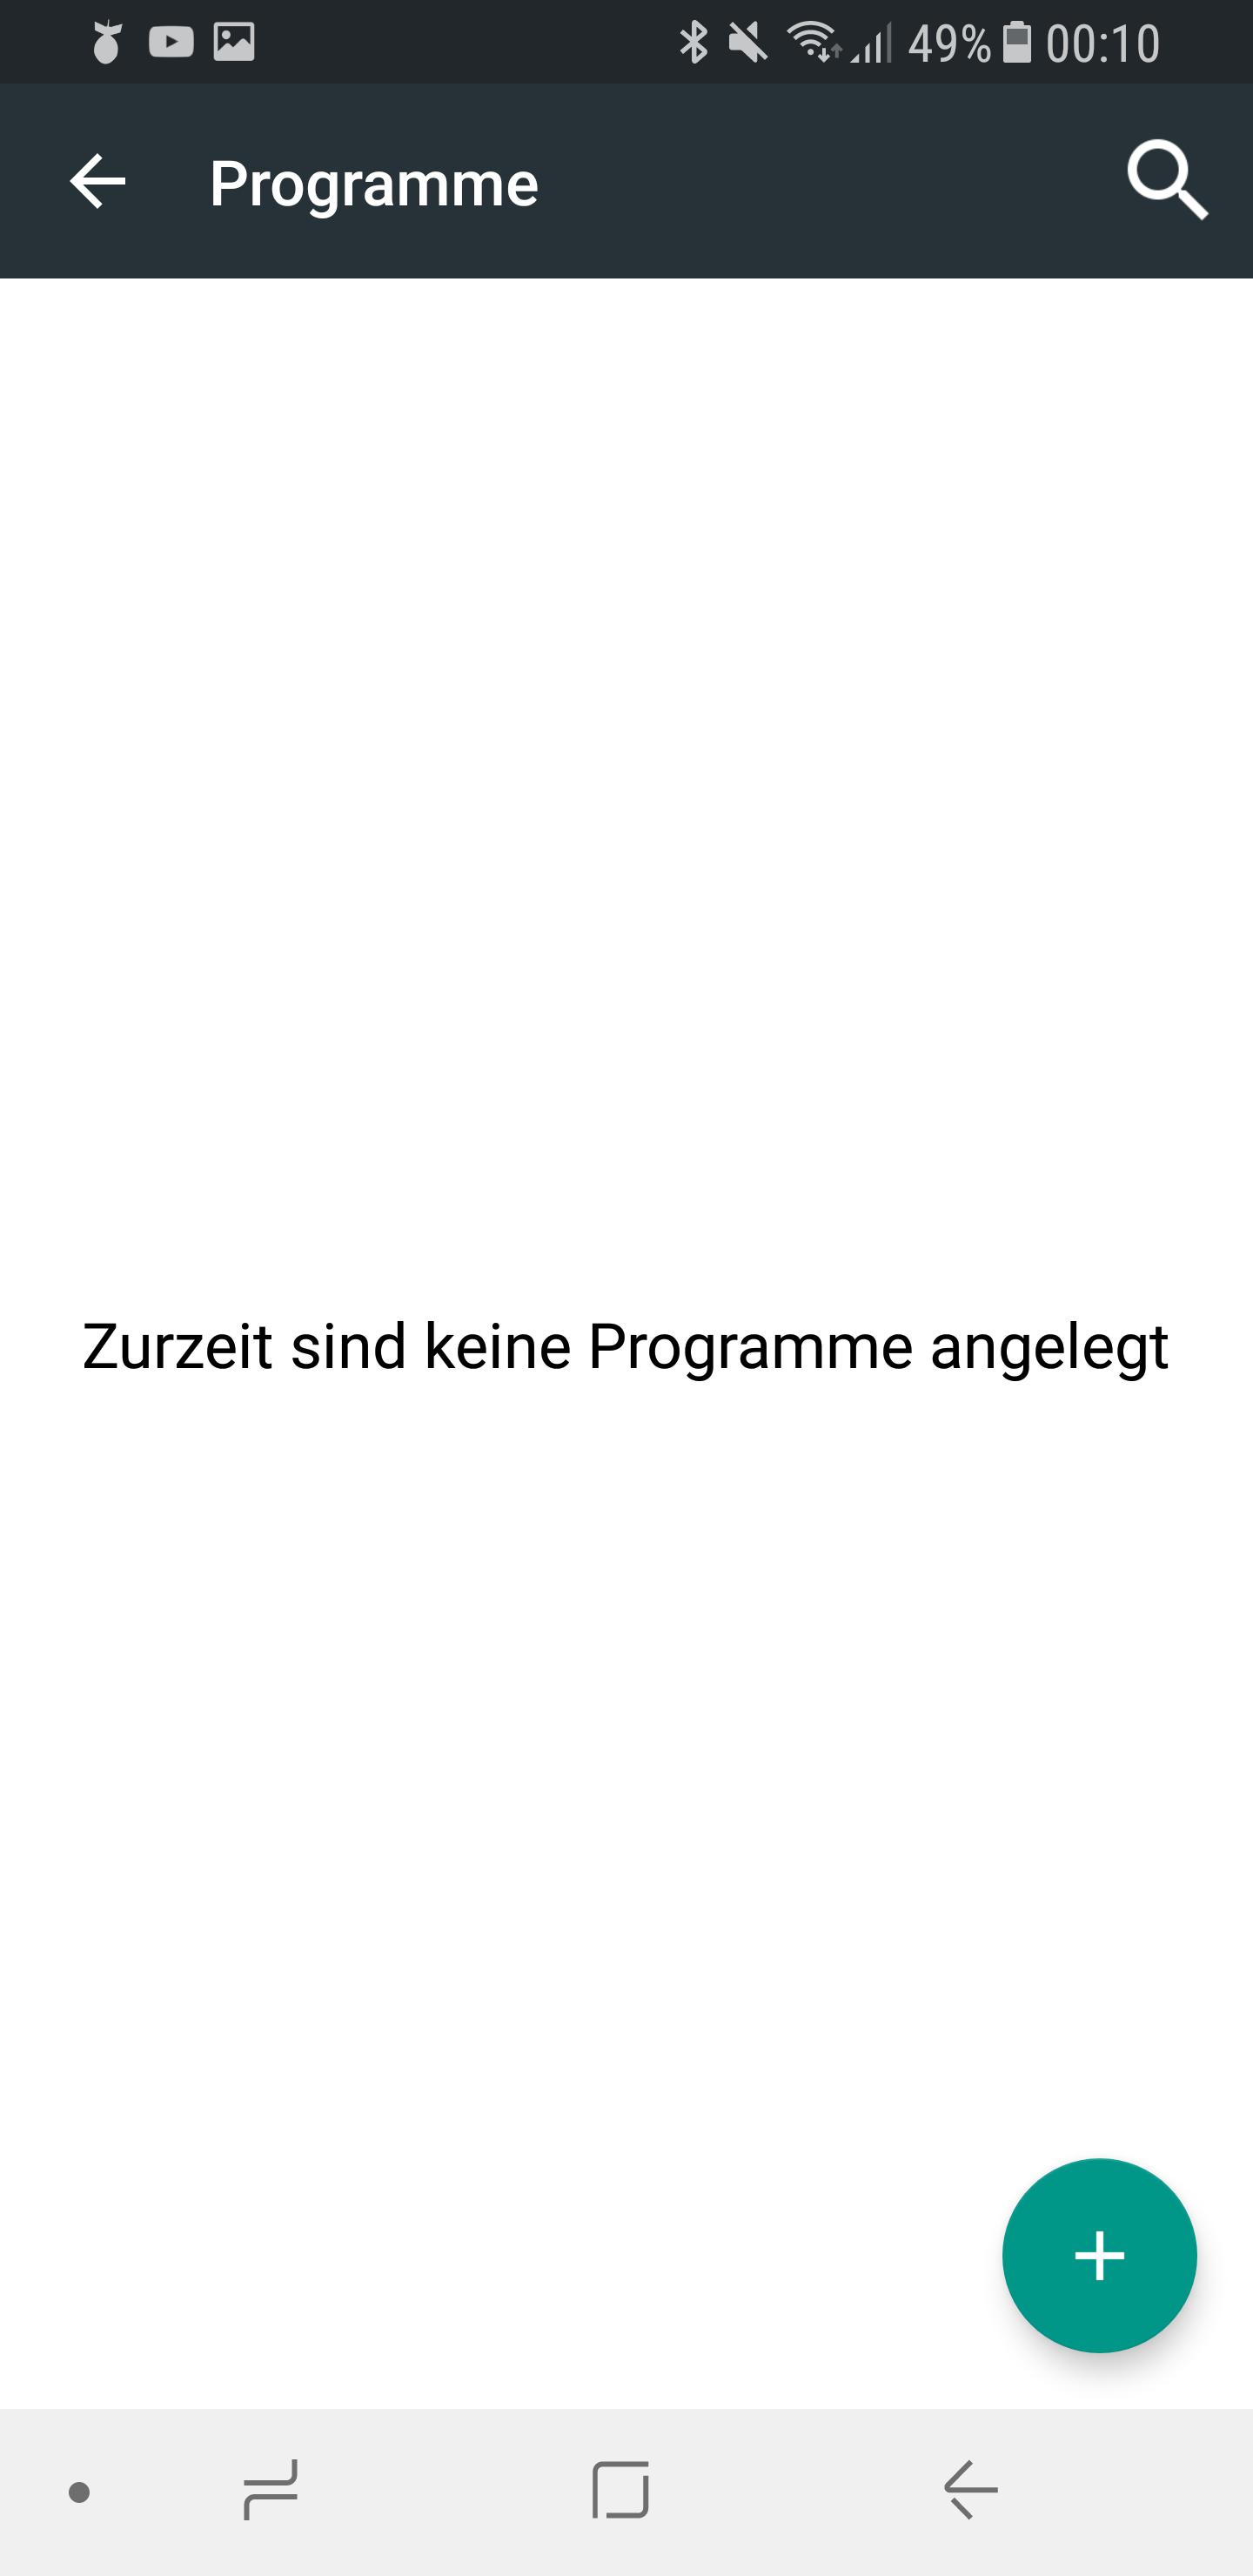 COQON-Programm-anlegen-1